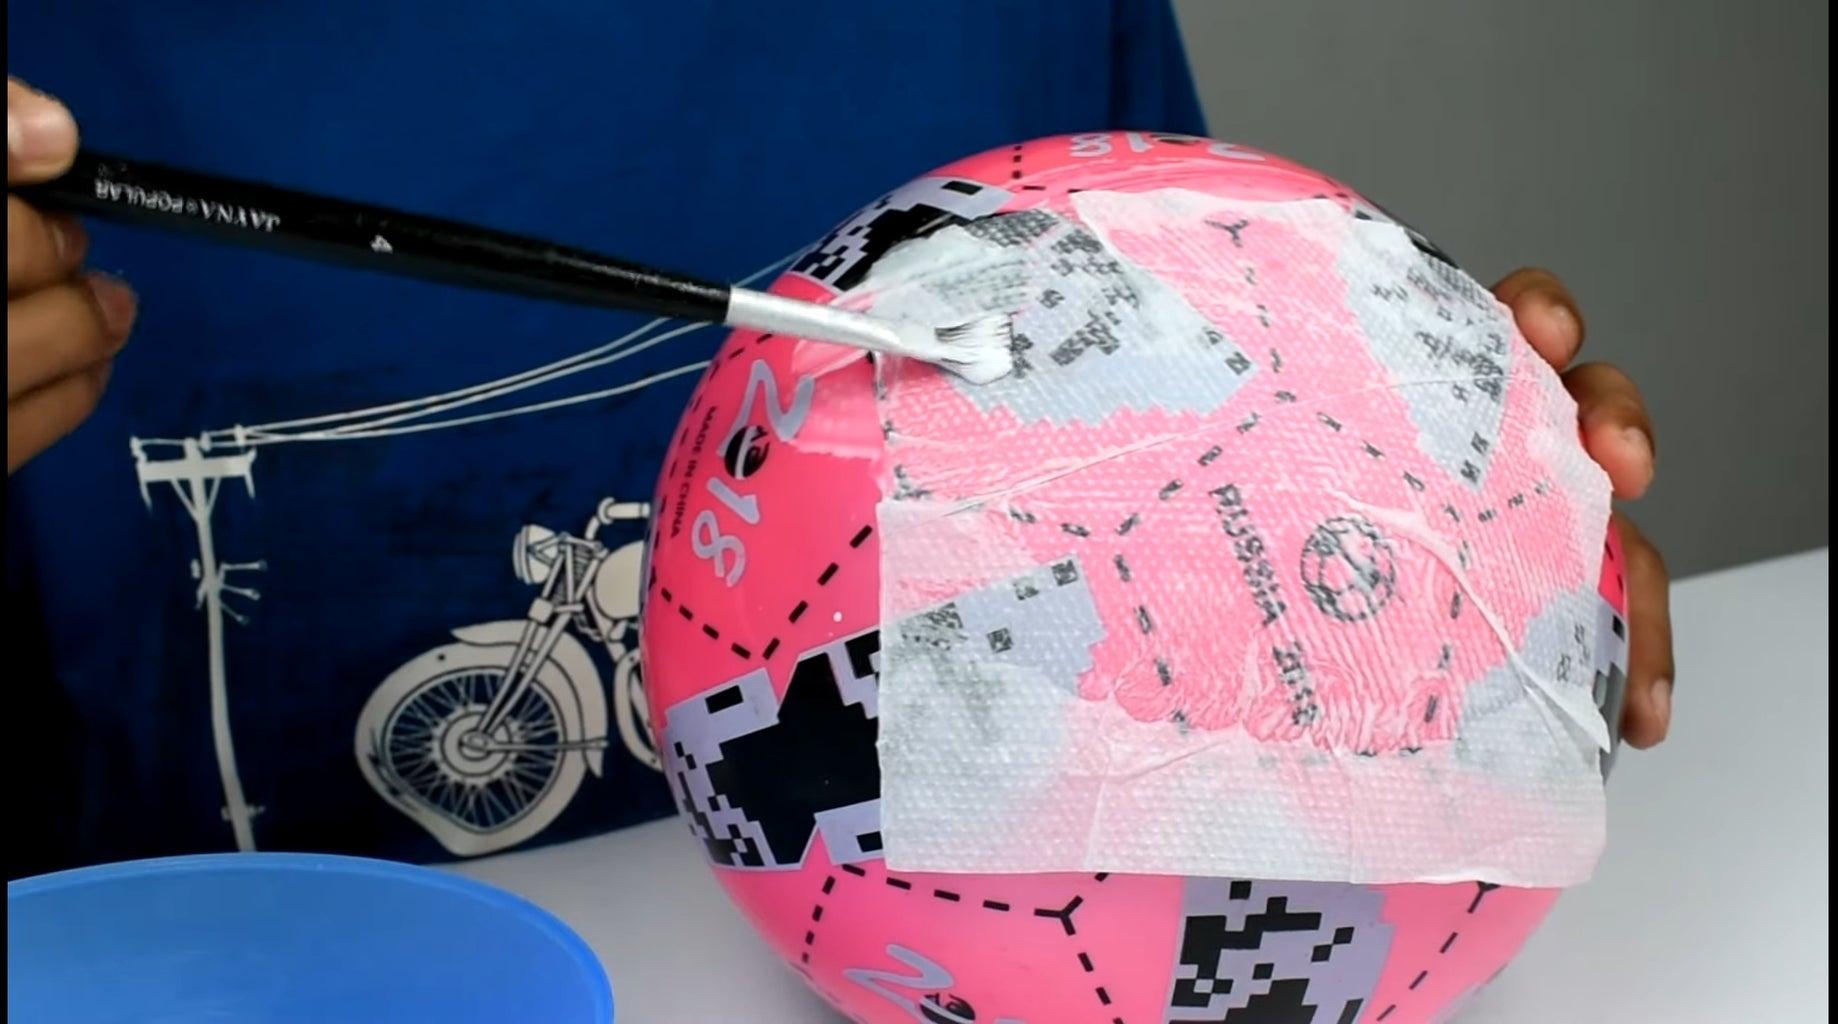 Stick Tissue Paper on Ball Using Fevicol/PVA Glue